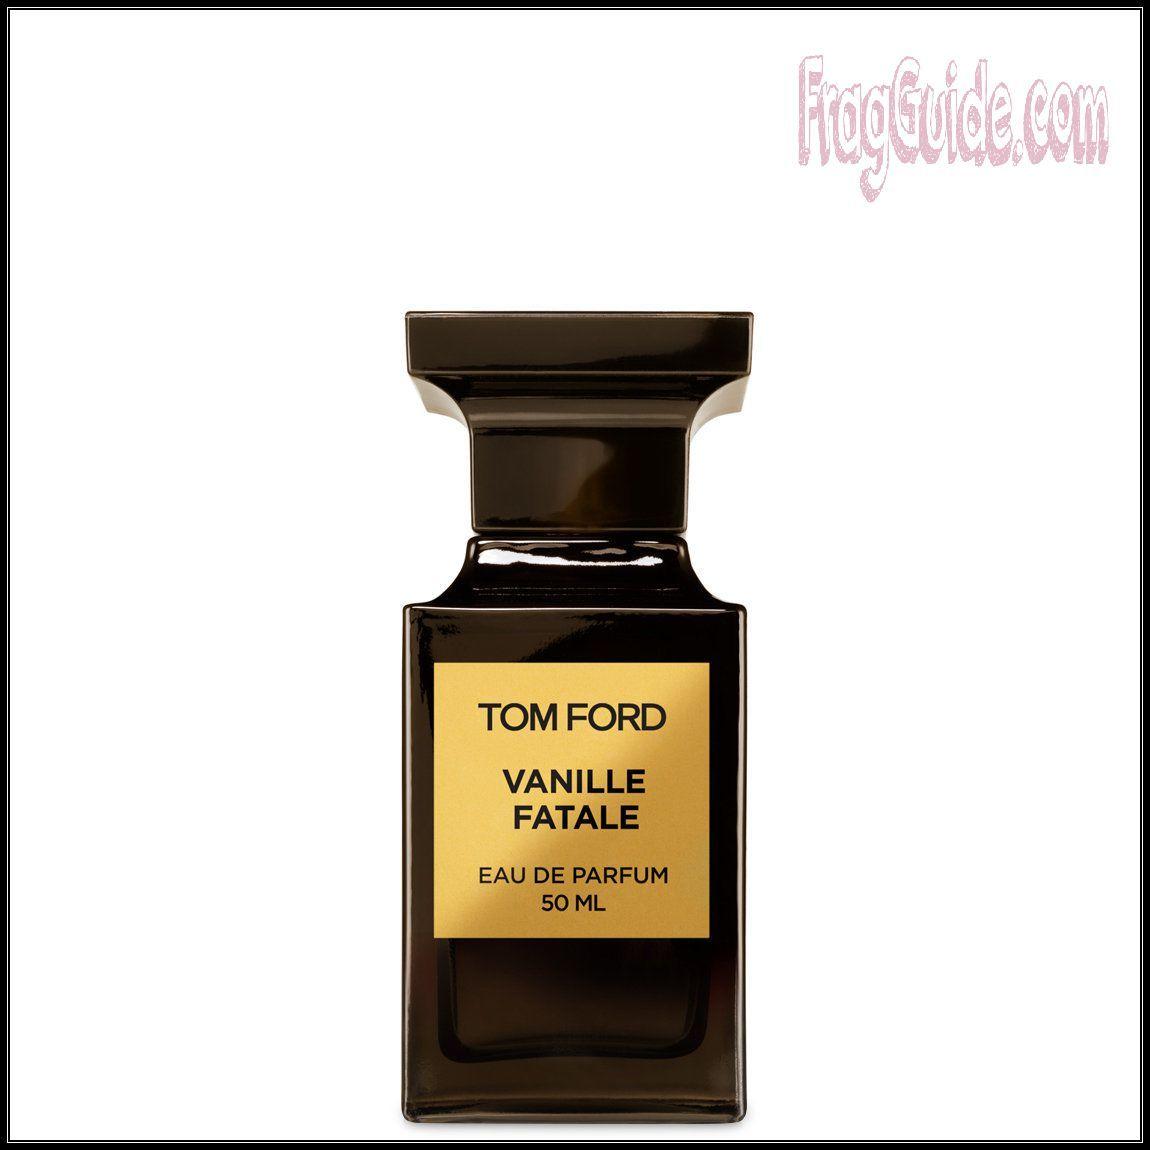 عطر Vanille Fatale من باقة عطور توم فورد Tom Ford للجنسين Eau De Parfum Perfume Bottles Perfume